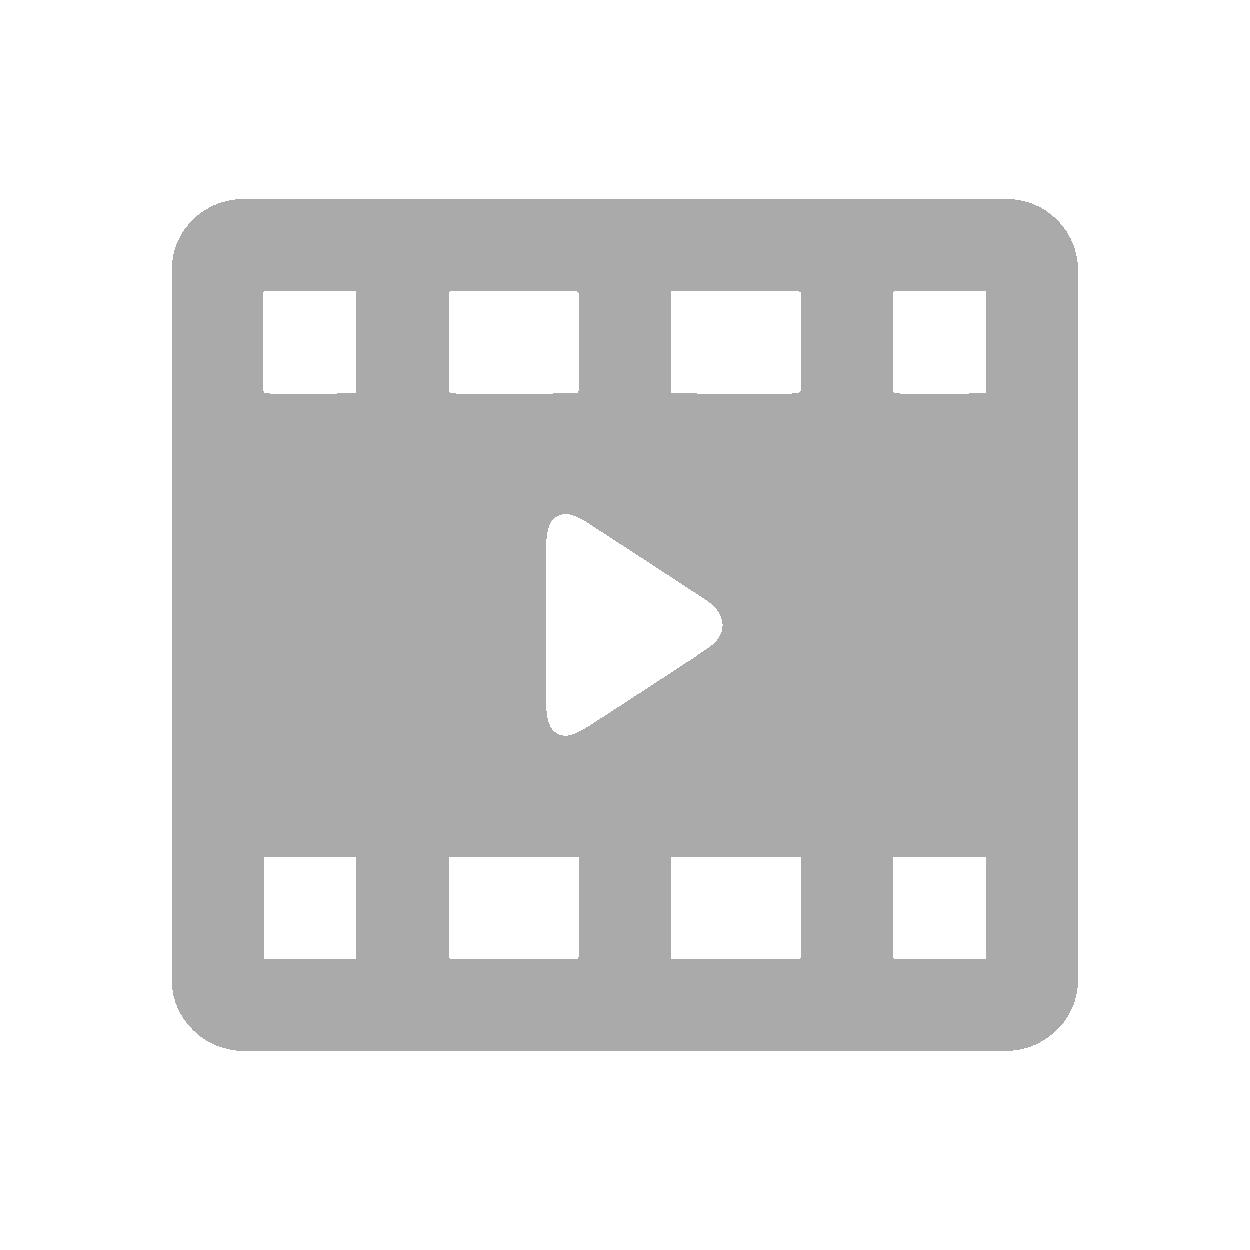 Iconos Sercivios_videos